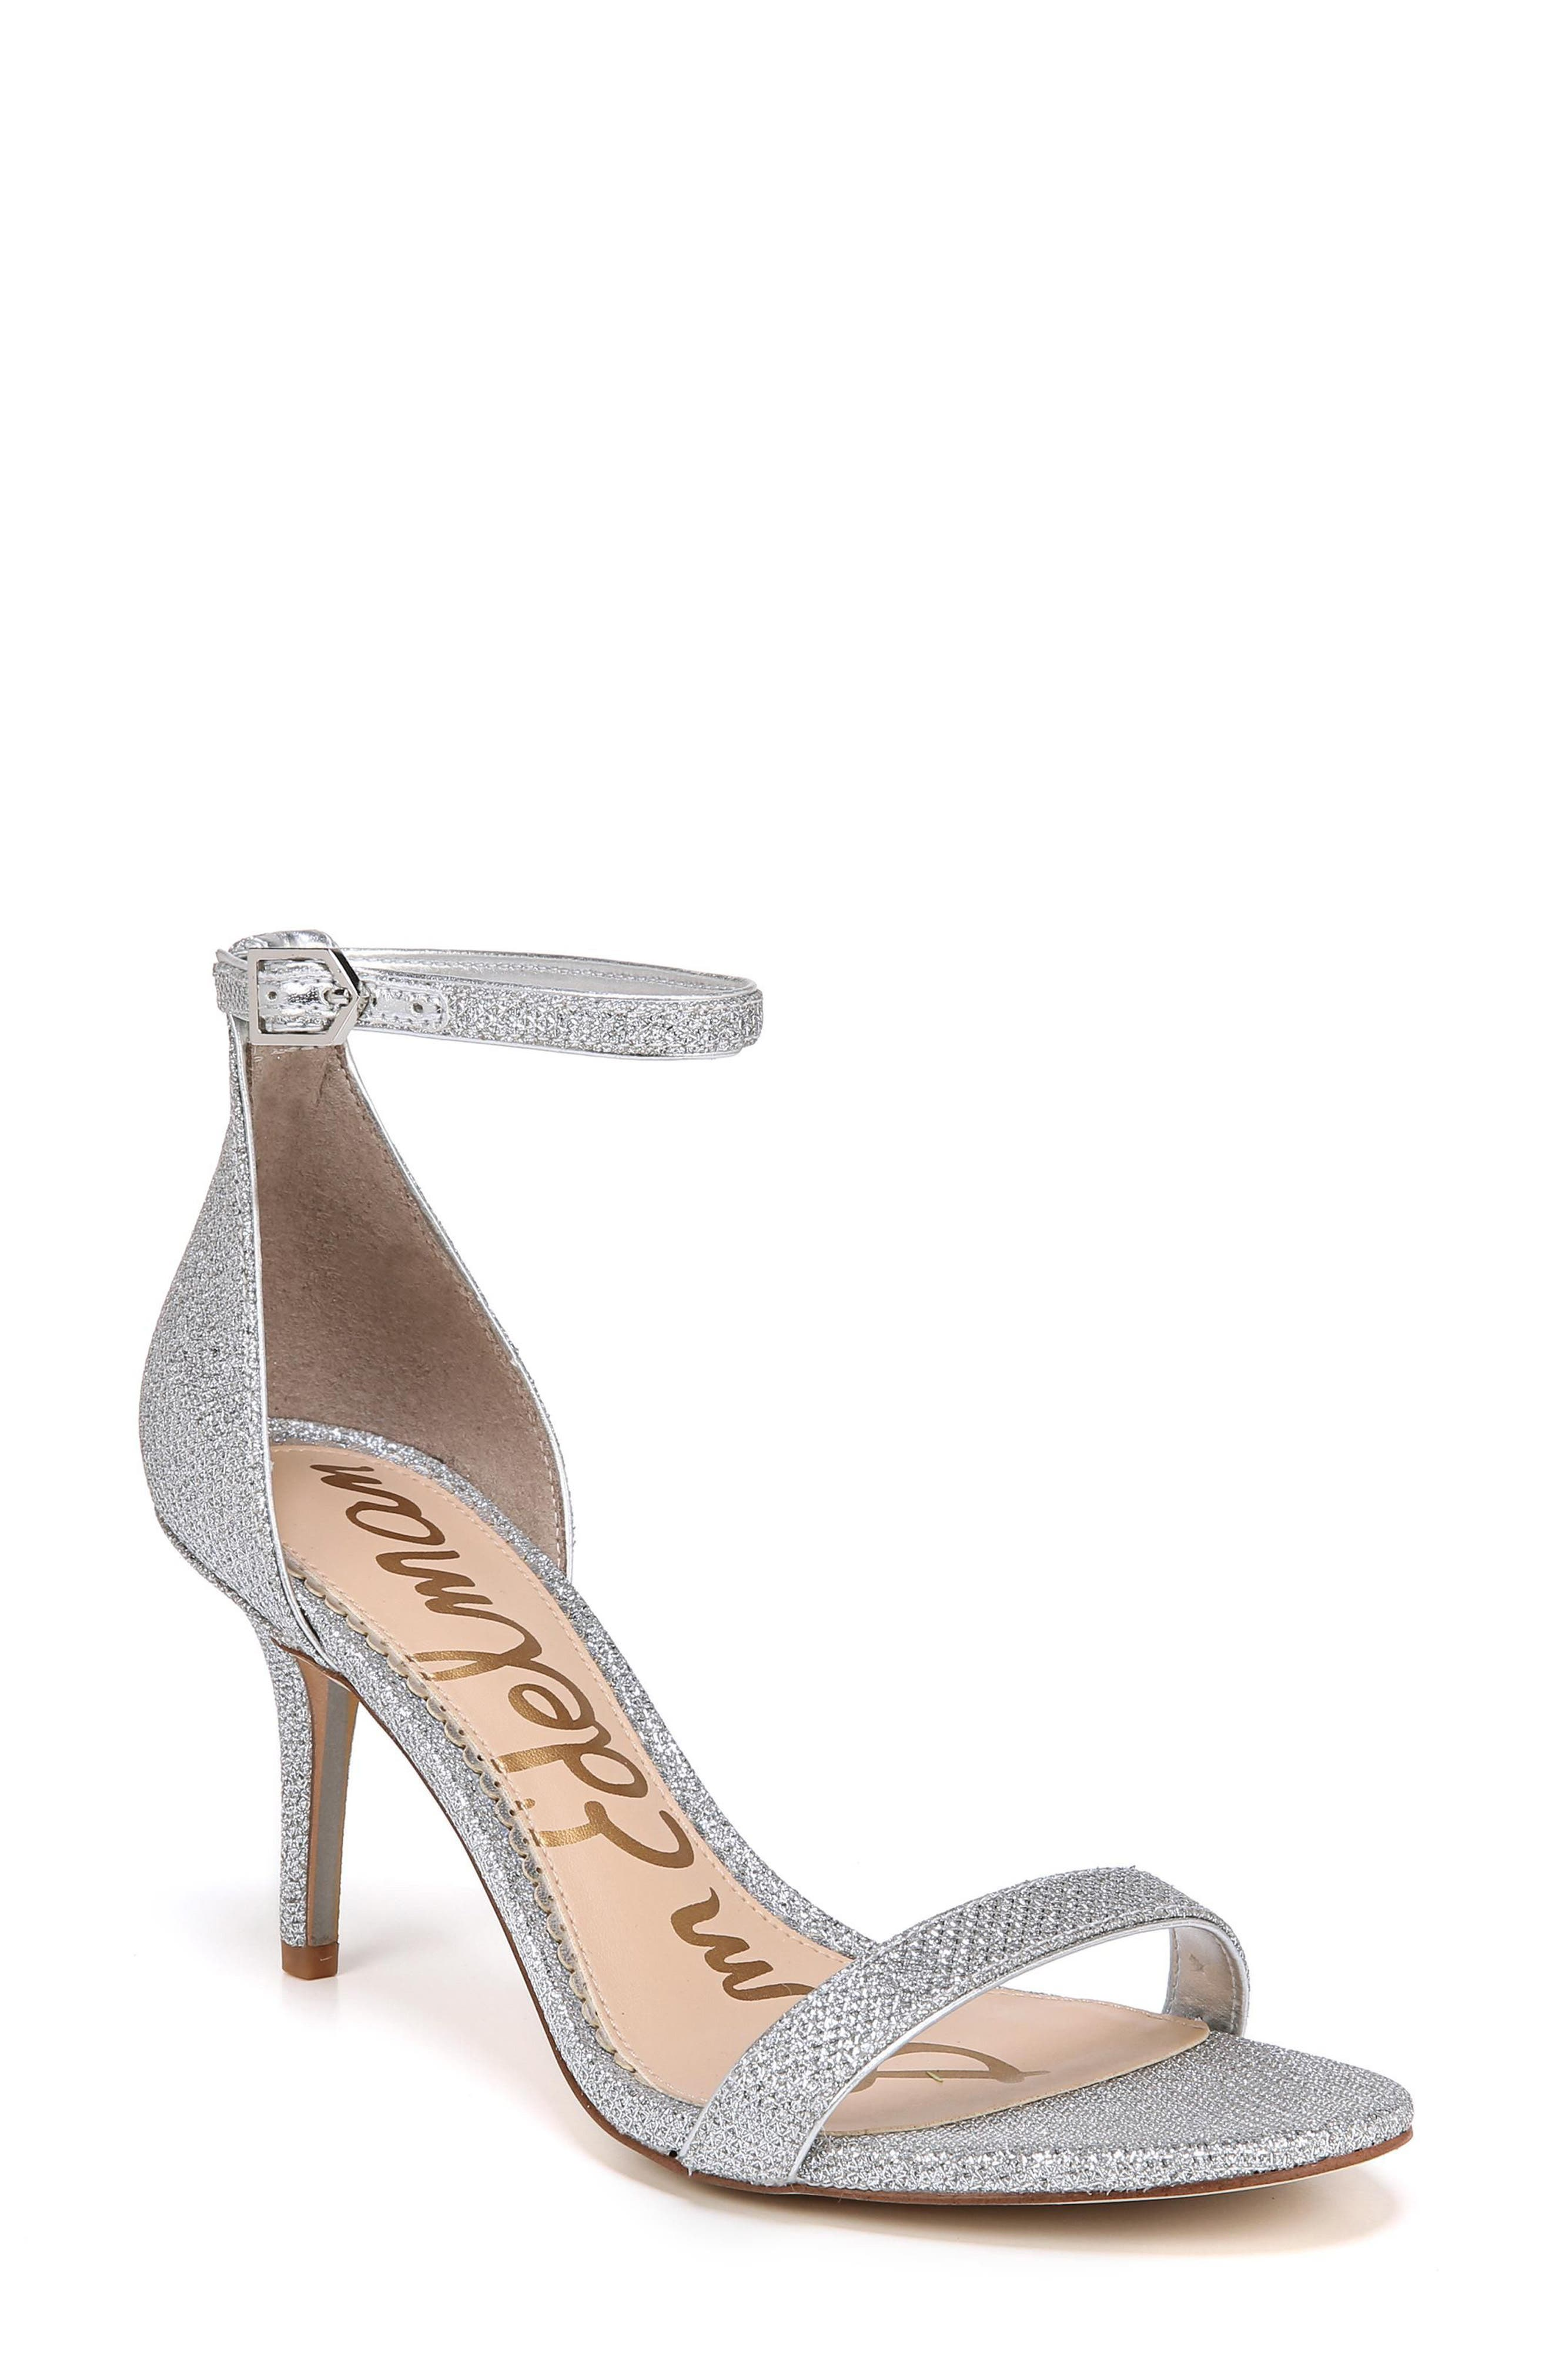 ,                             'Patti' Ankle Strap Sandal,                             Main thumbnail 33, color,                             041